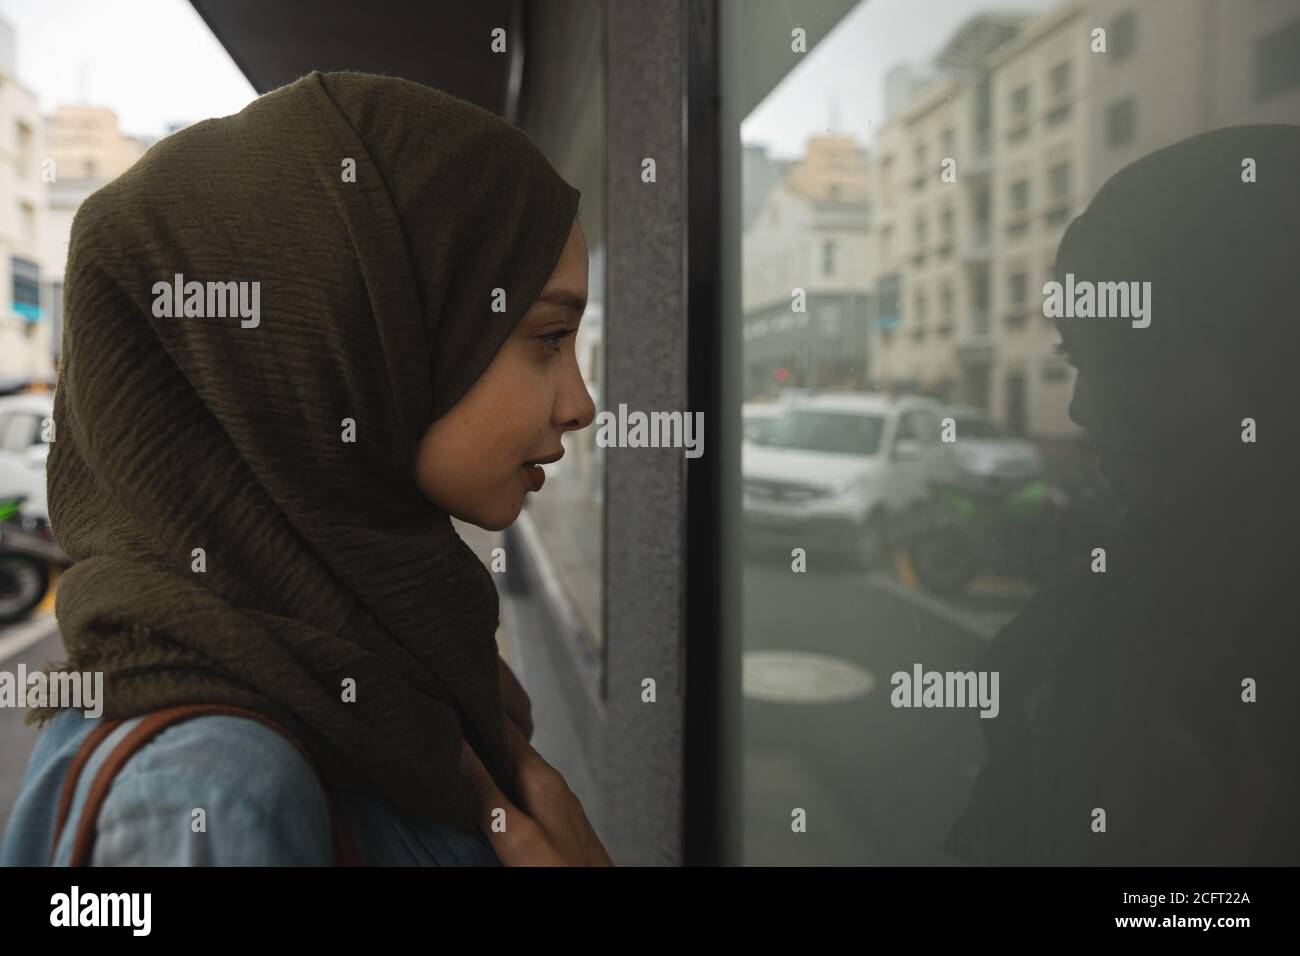 Woman in hijab looking through a shop window Stock Photo